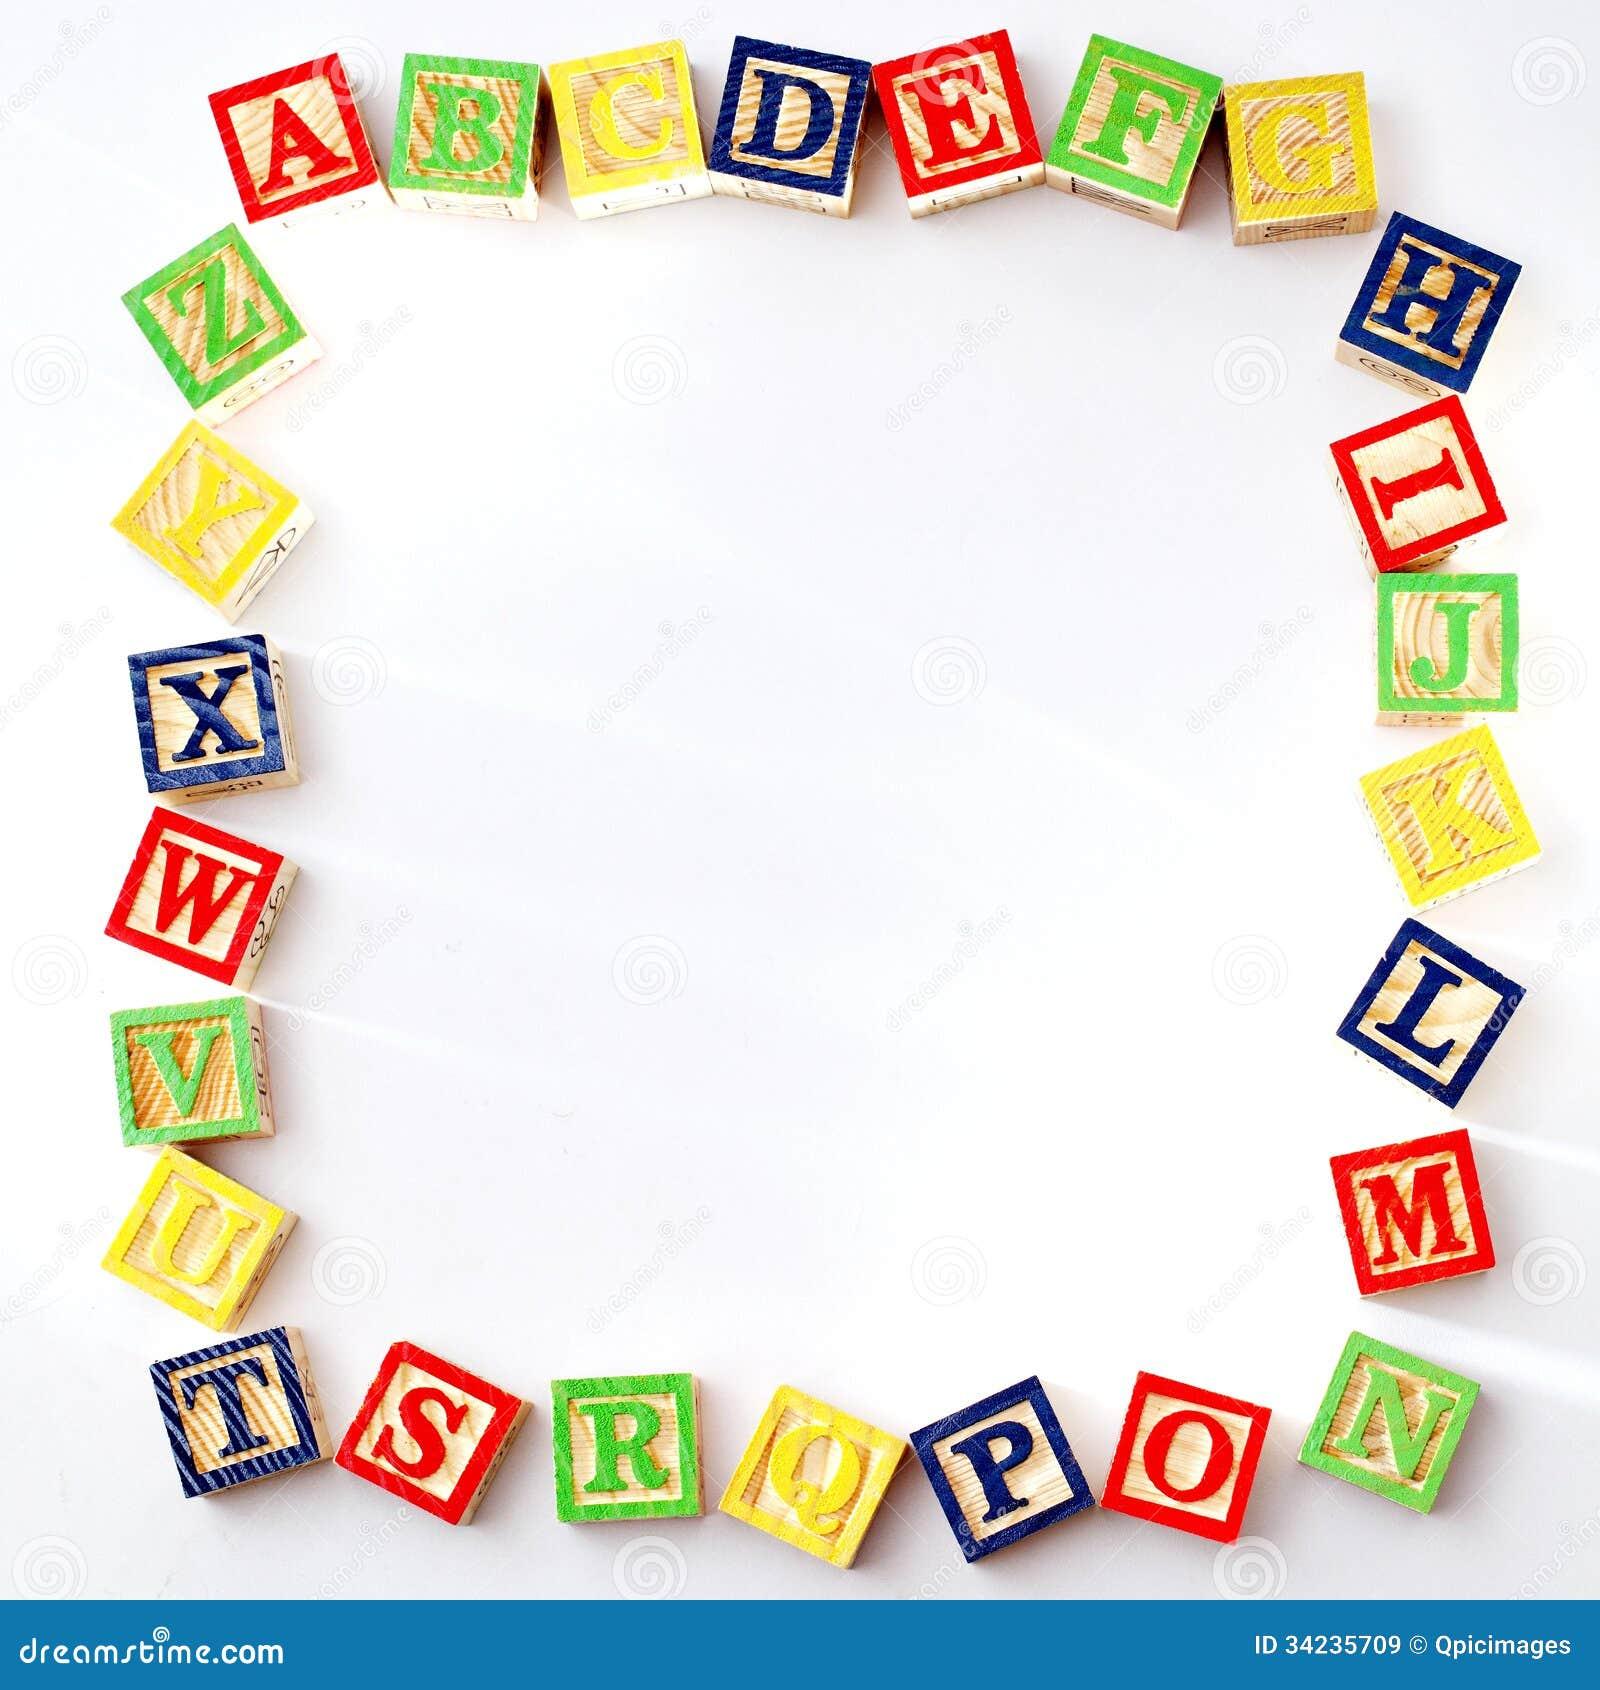 Alphabet B Wallpaper Photos of Alphabet B Wallpaper for